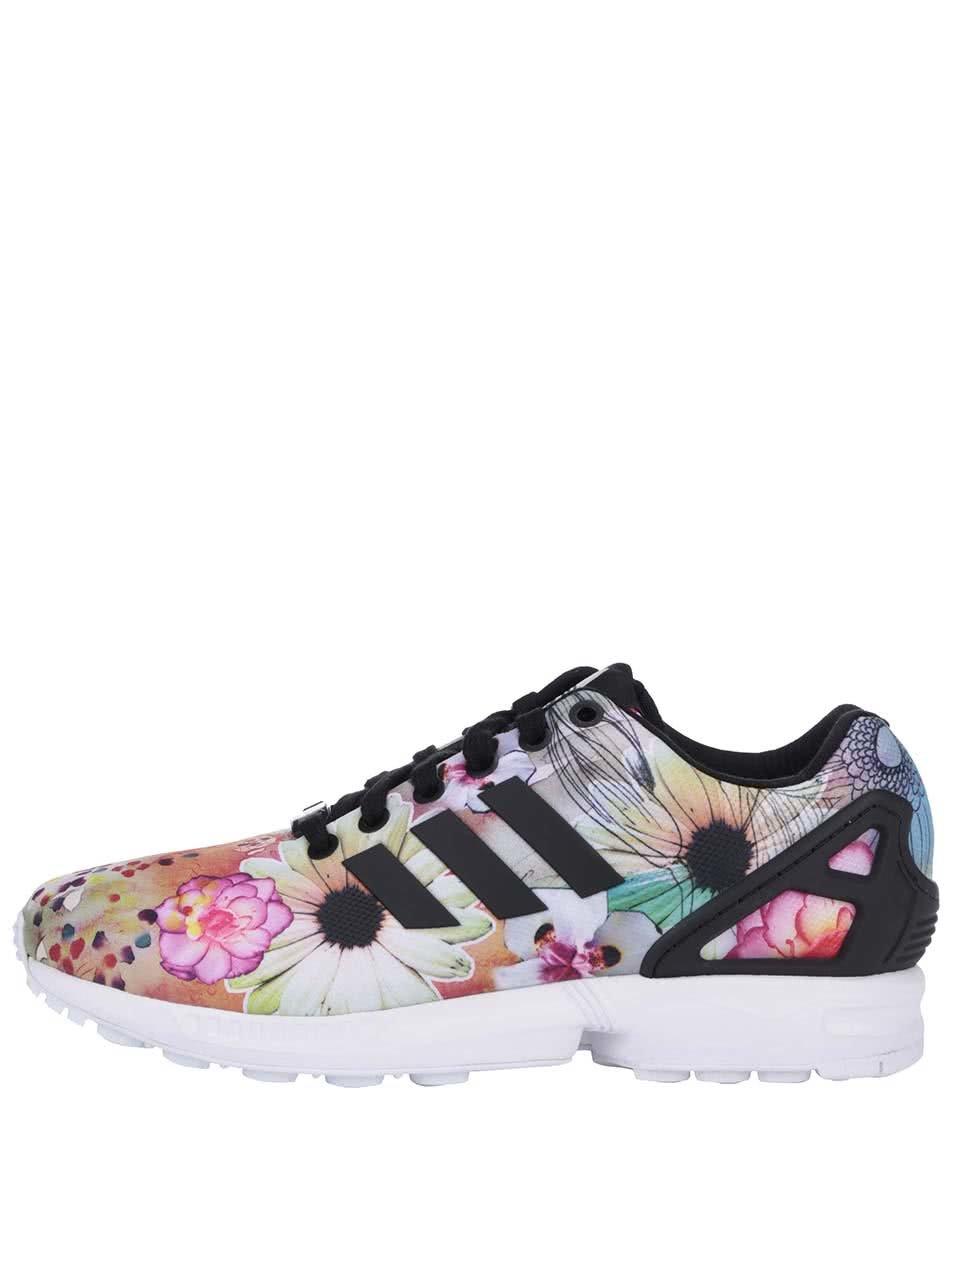 Barevné dámské květované tenisky adidas Originals ZX Flux W ... 9ab13daa699